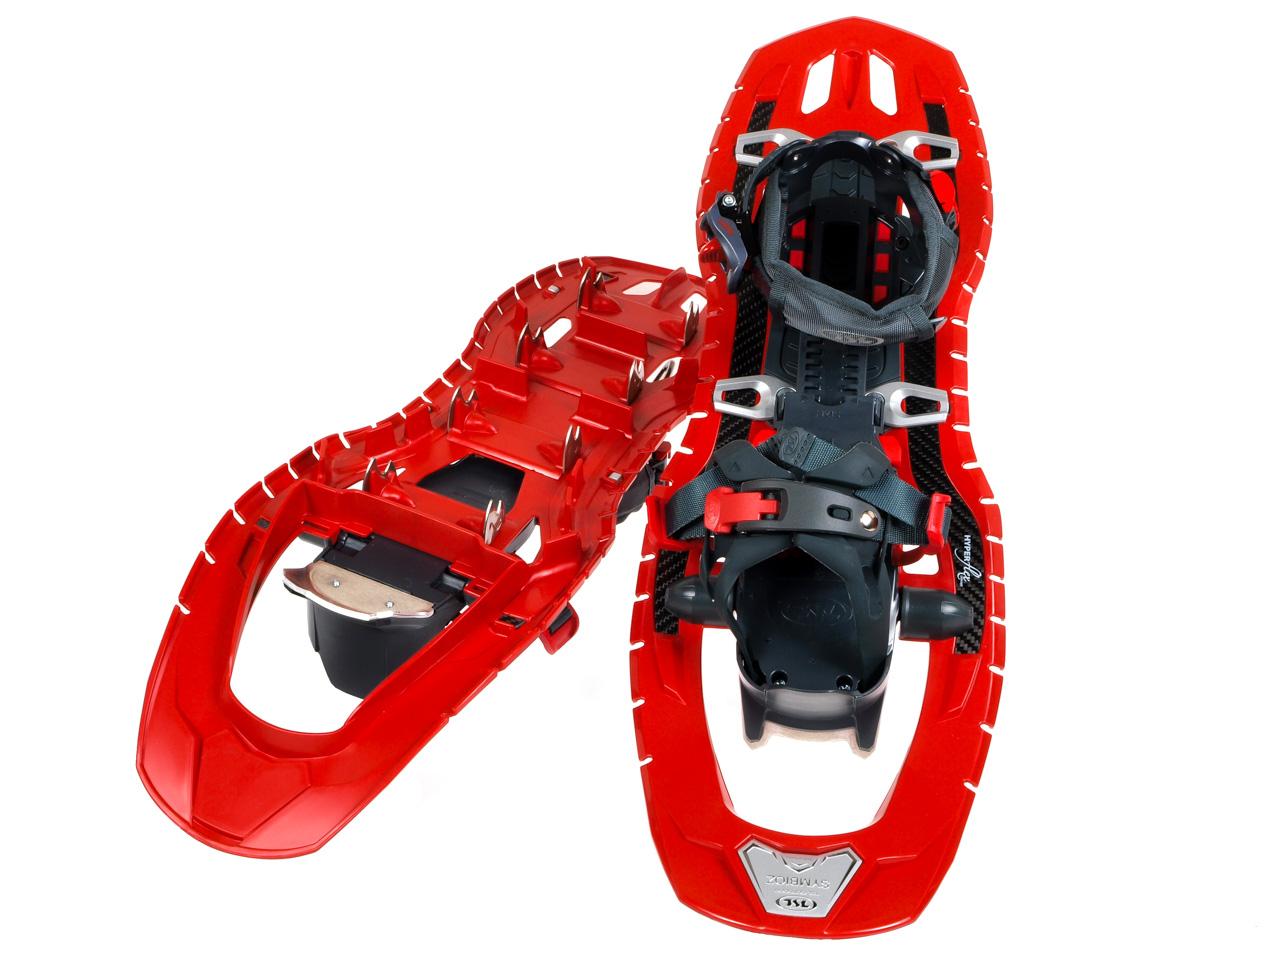 raquettes neige tsl symbioze elite m rouge rouge 52115. Black Bedroom Furniture Sets. Home Design Ideas